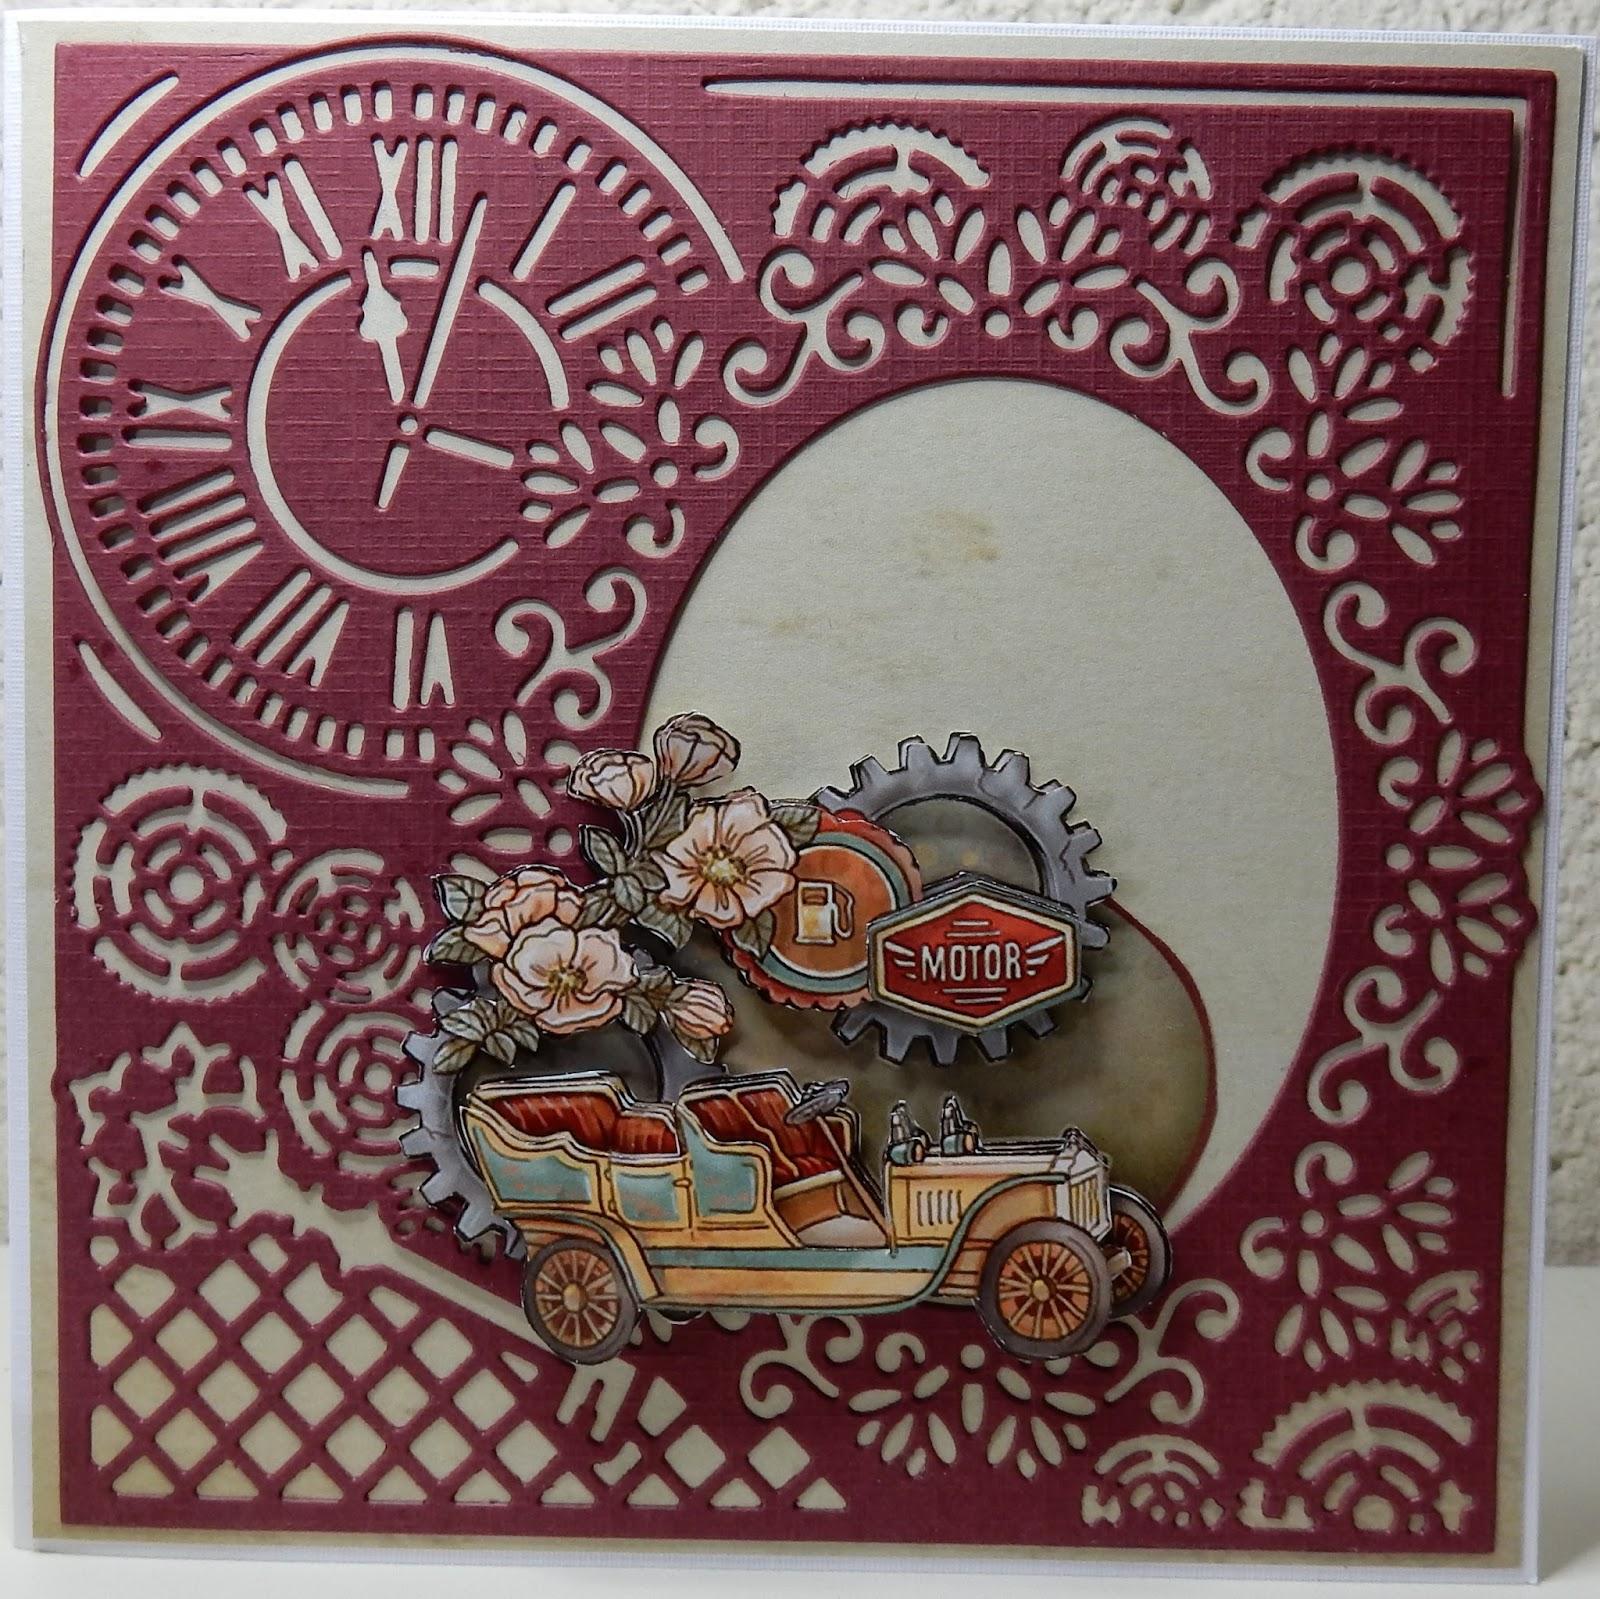 Bekend Hetty's Knutselhokkie!: Vintage Objects van Yvonne Creations #IE64